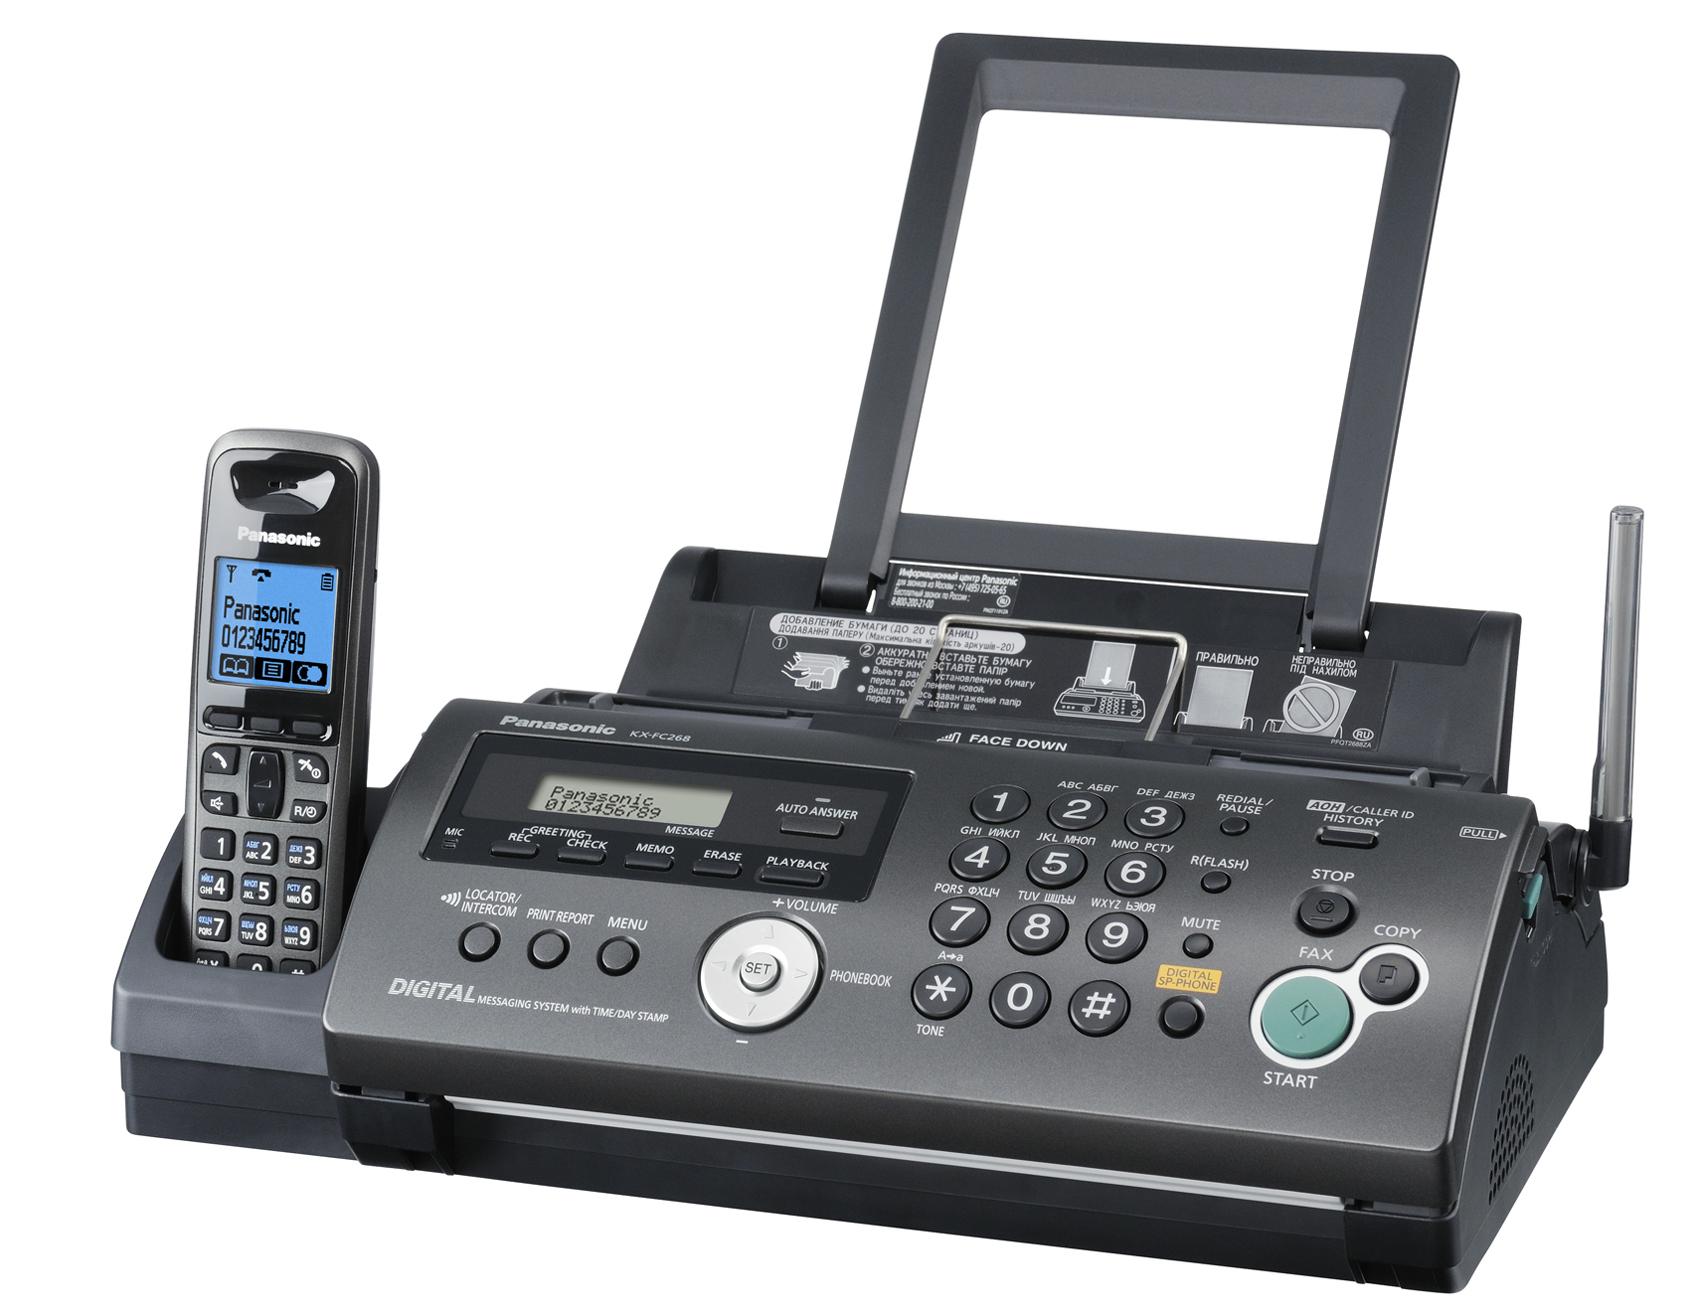 как распечатать отчет на факсе panasonic kx-ft982